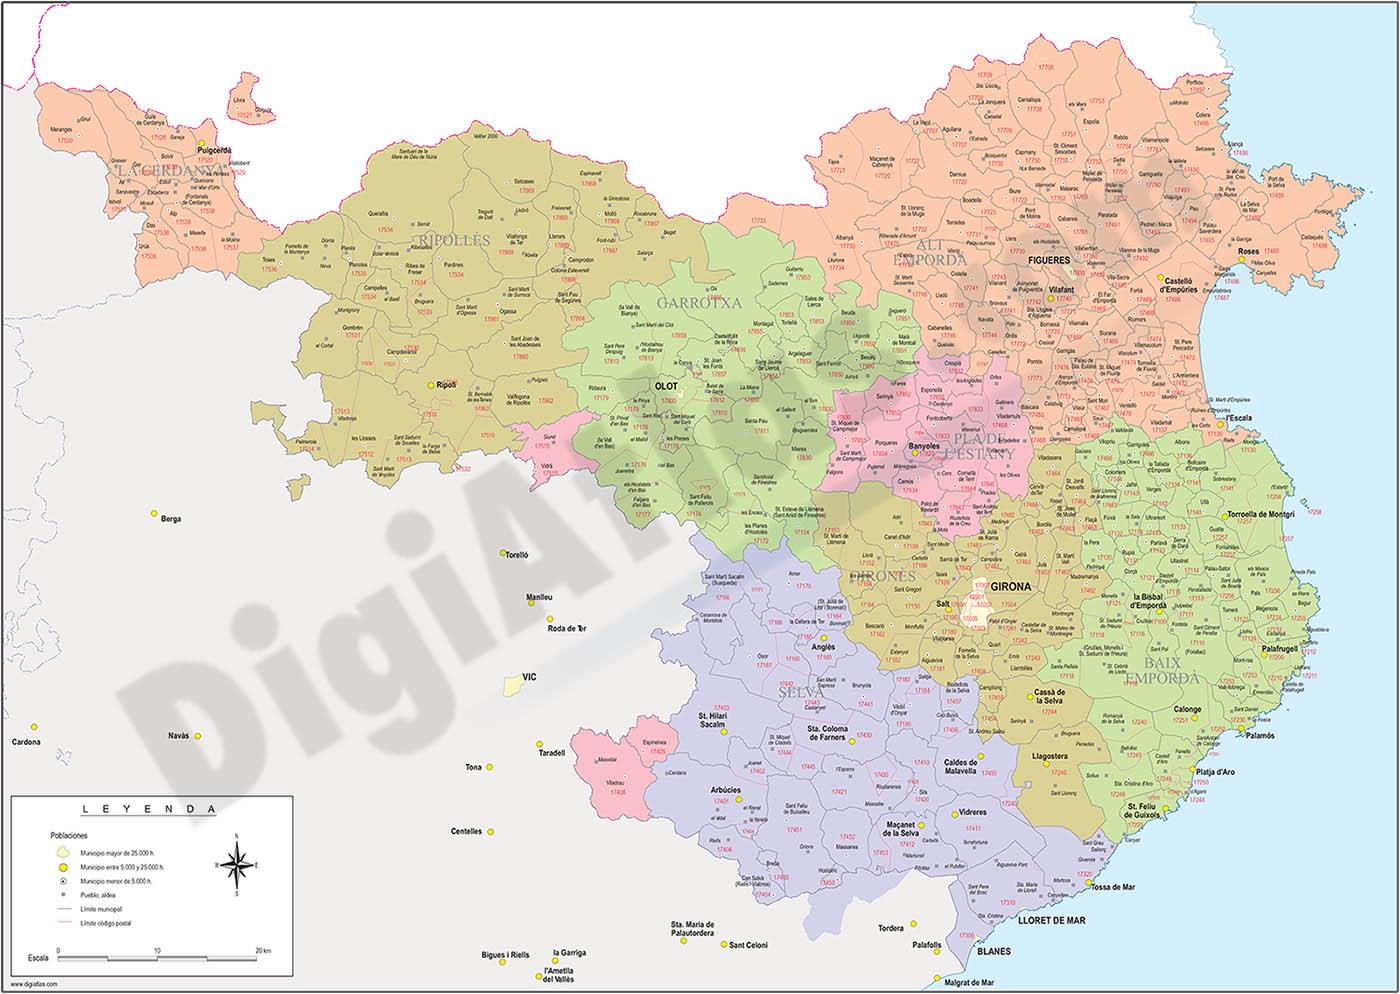 Mapa De Girona Provincia.Digiatlas Mapas Y Planos Digitales Mapas De Codigos Postales